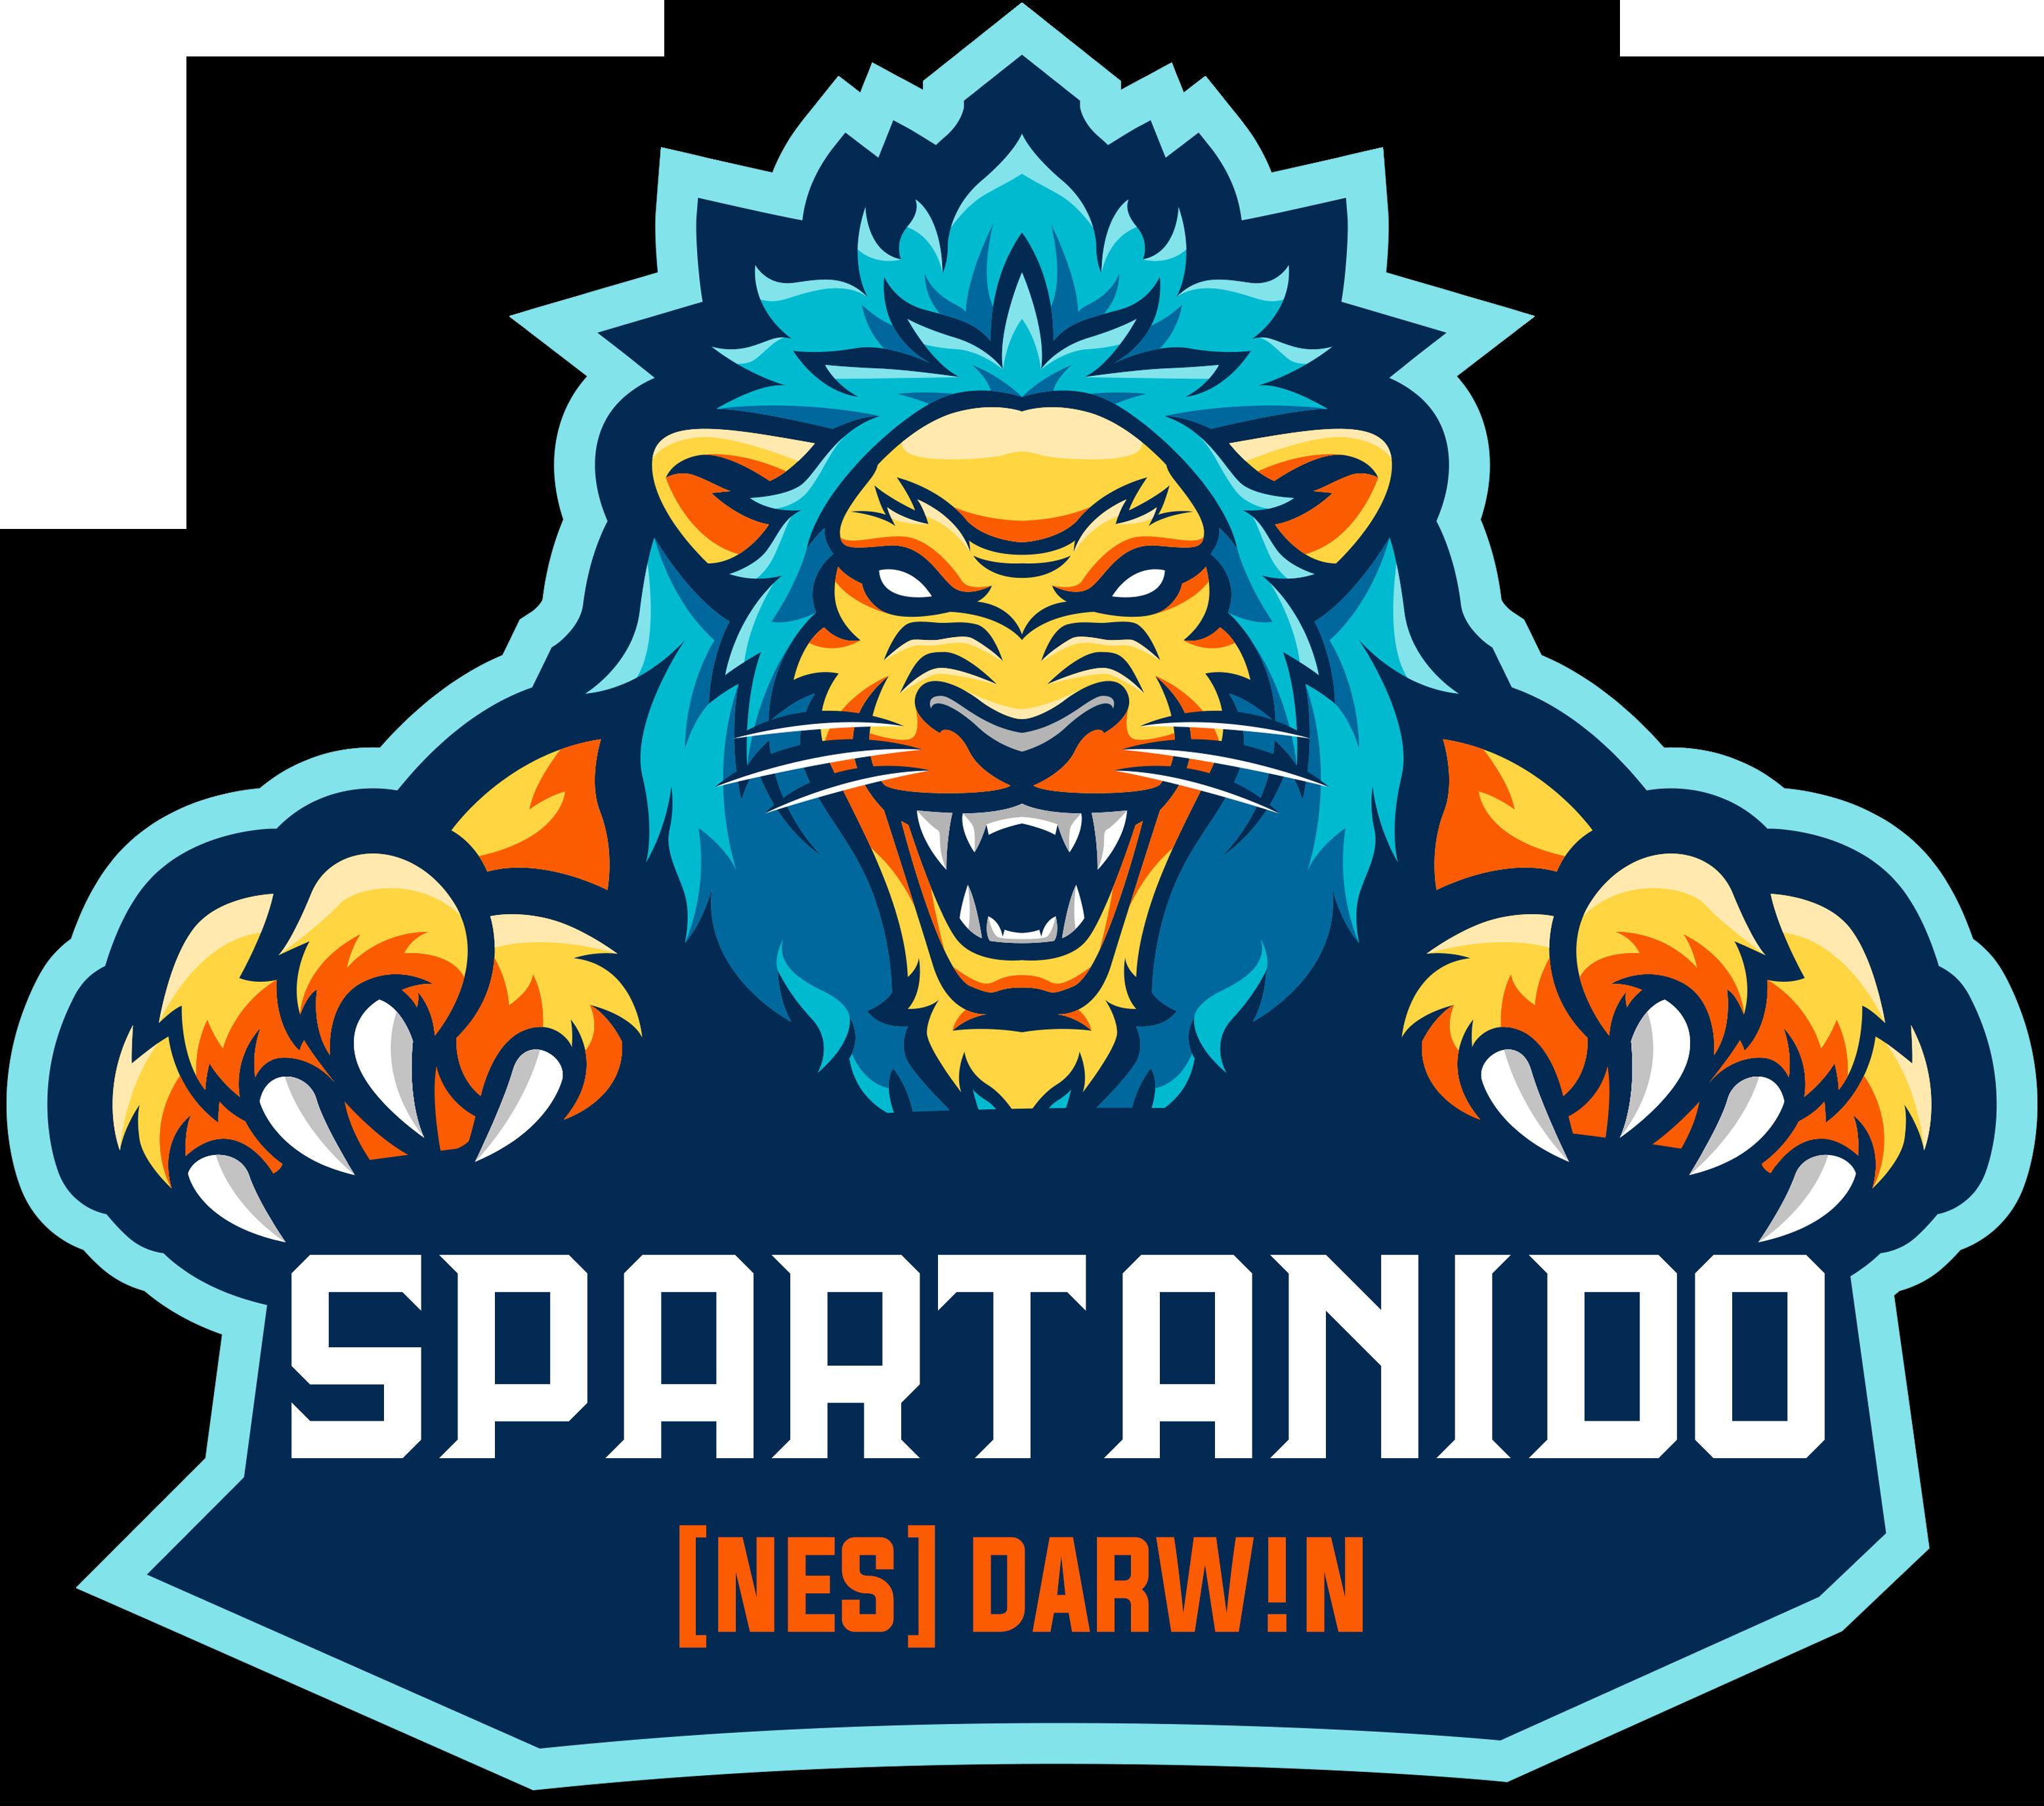 Nantes Esport Spartanid0